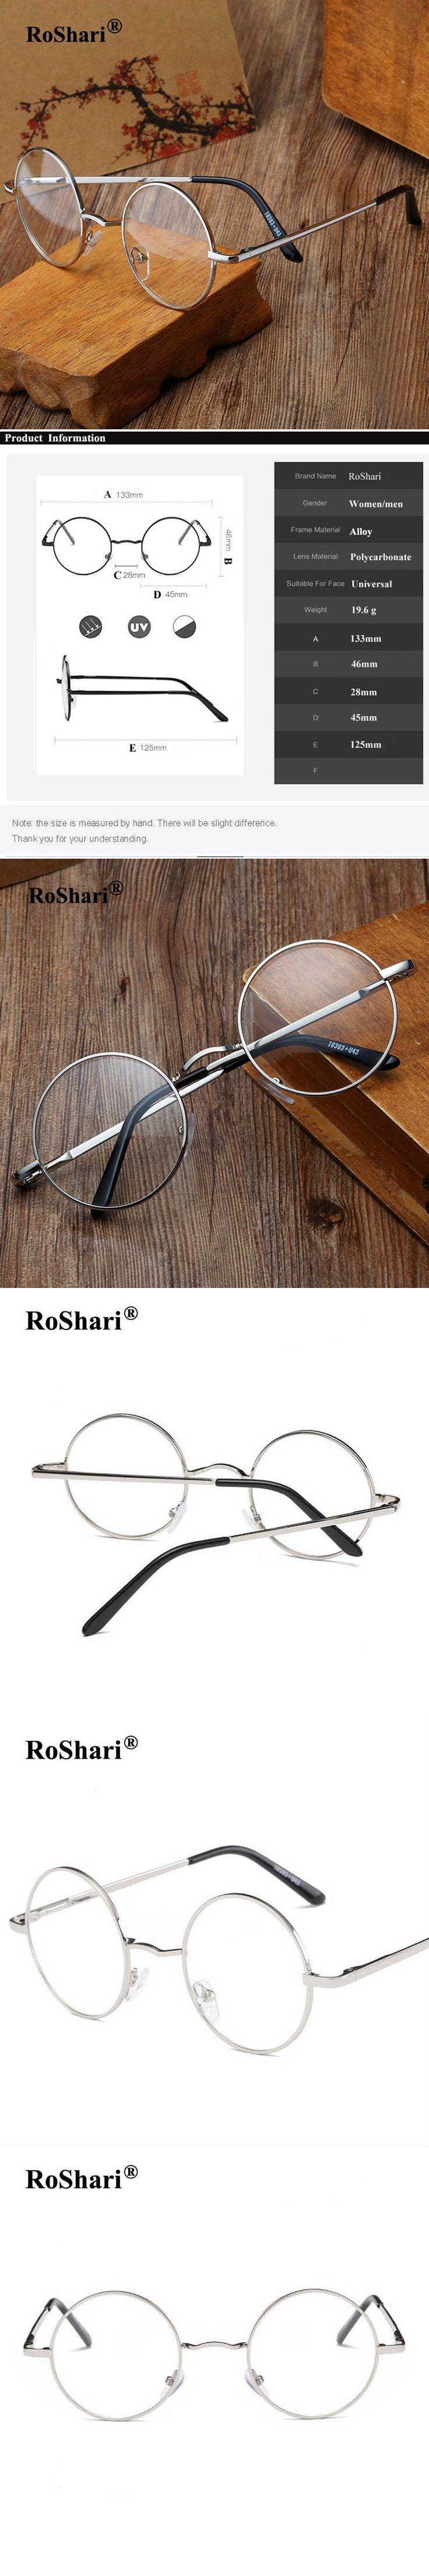 RoShari Vintage steampunk Sunglasses Women Men Brand Designer Clear Round Sun Glasses men Changed Nerd sunglass oculos de sol